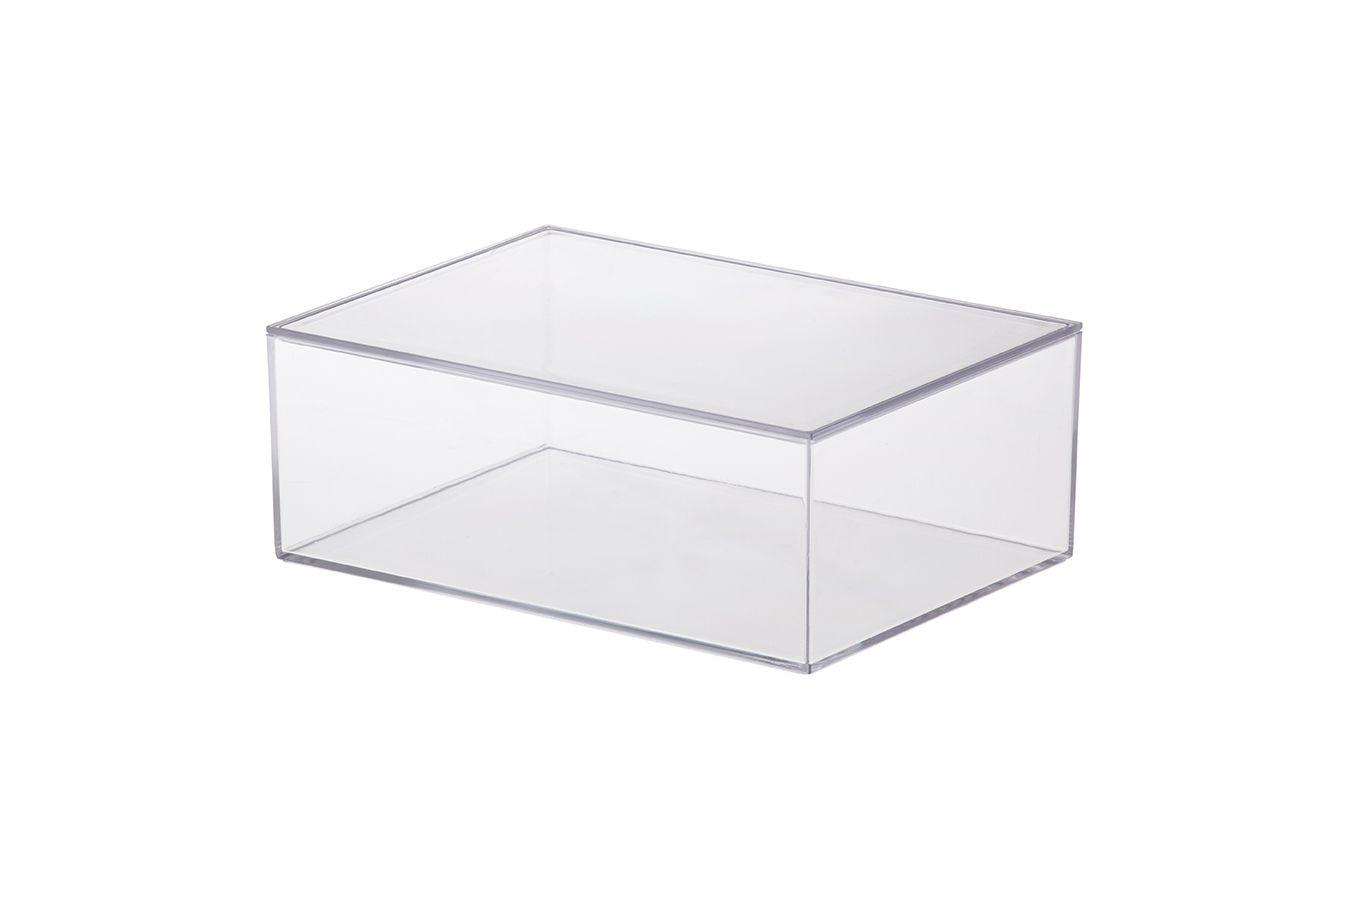 Caixa Organizadora c/ Tampa 22,5x16,5x8,5cm